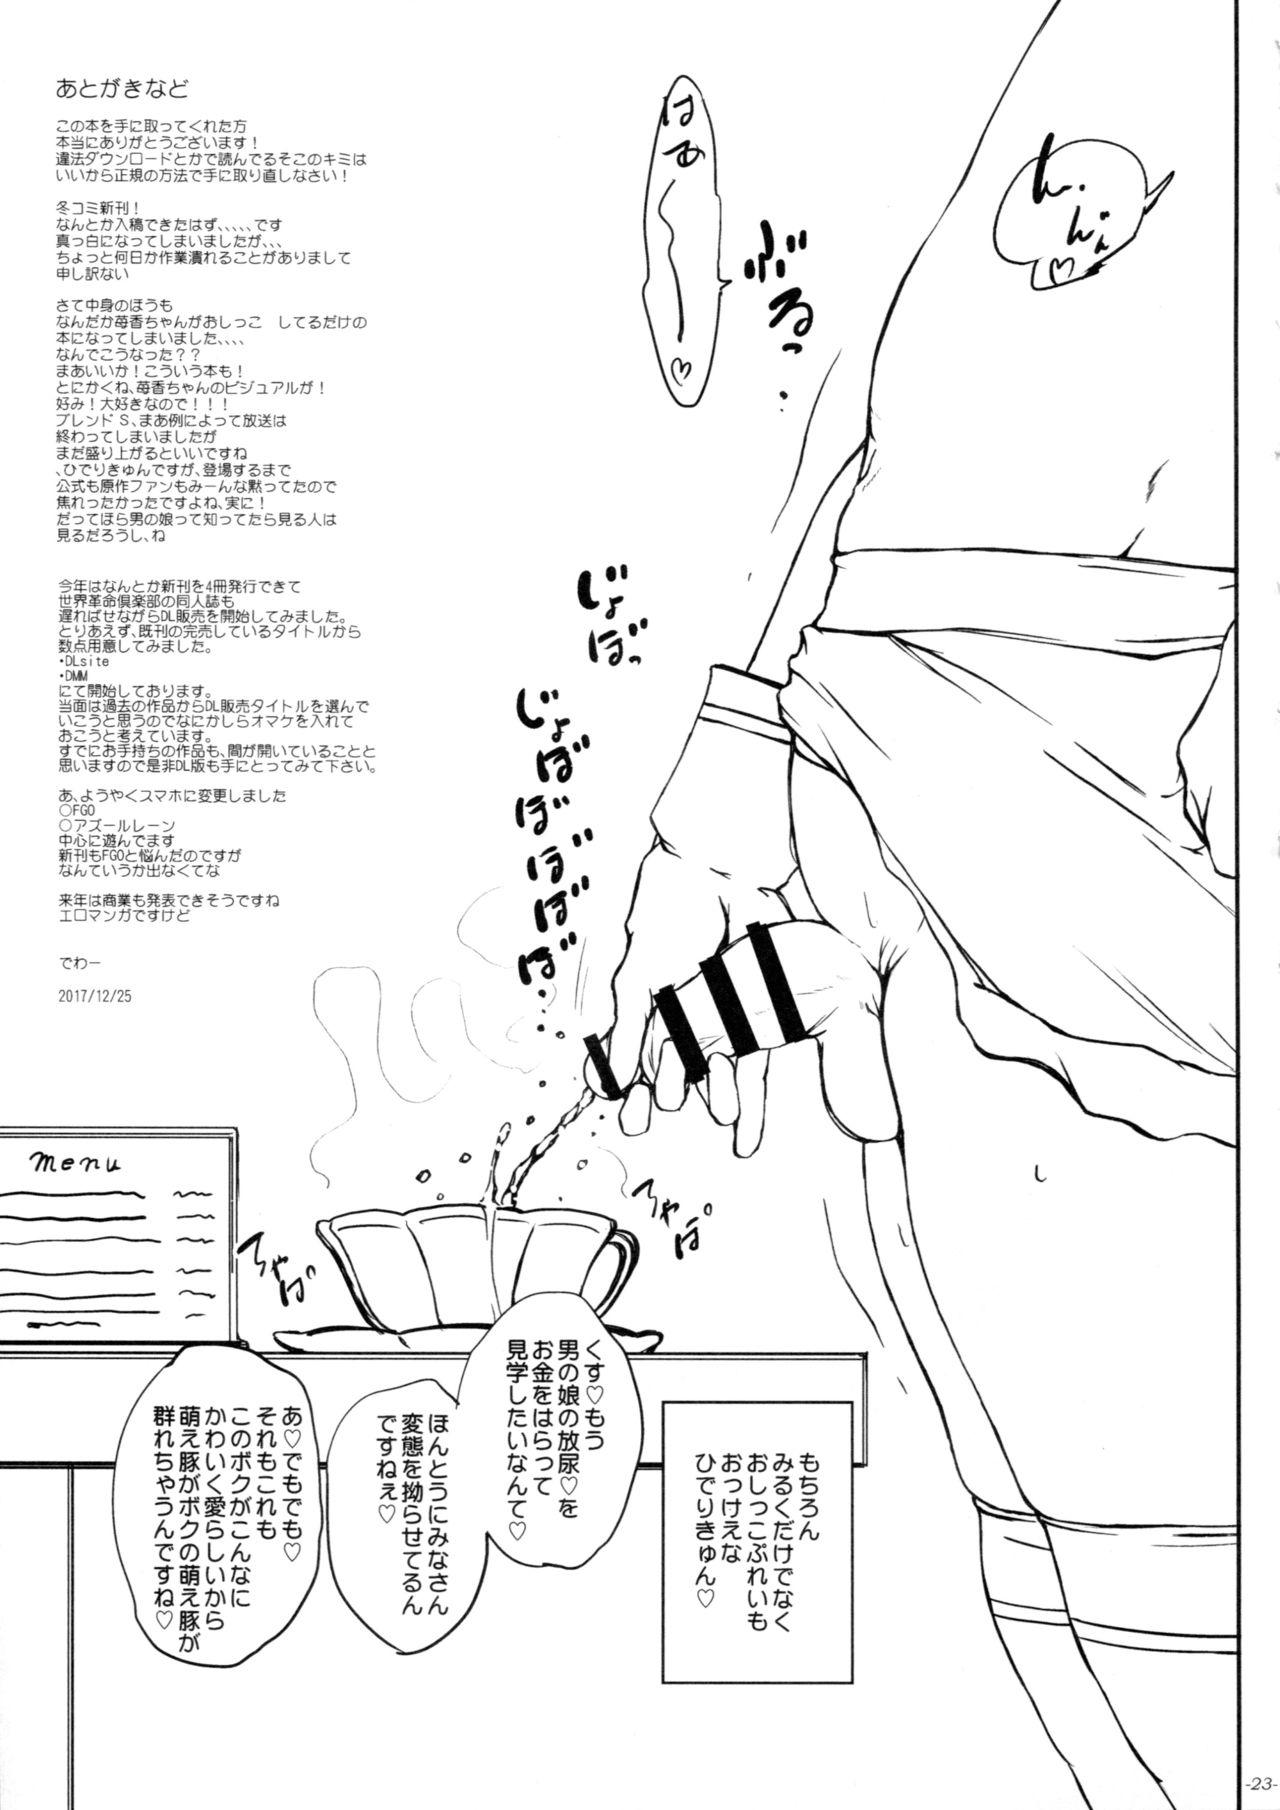 (C93) [Sekai Kakumei Club (Ozawa Reido)] Otou-san, Okaa-san, Ikagawashii Omise de Gomennasai. (Blend S) 23